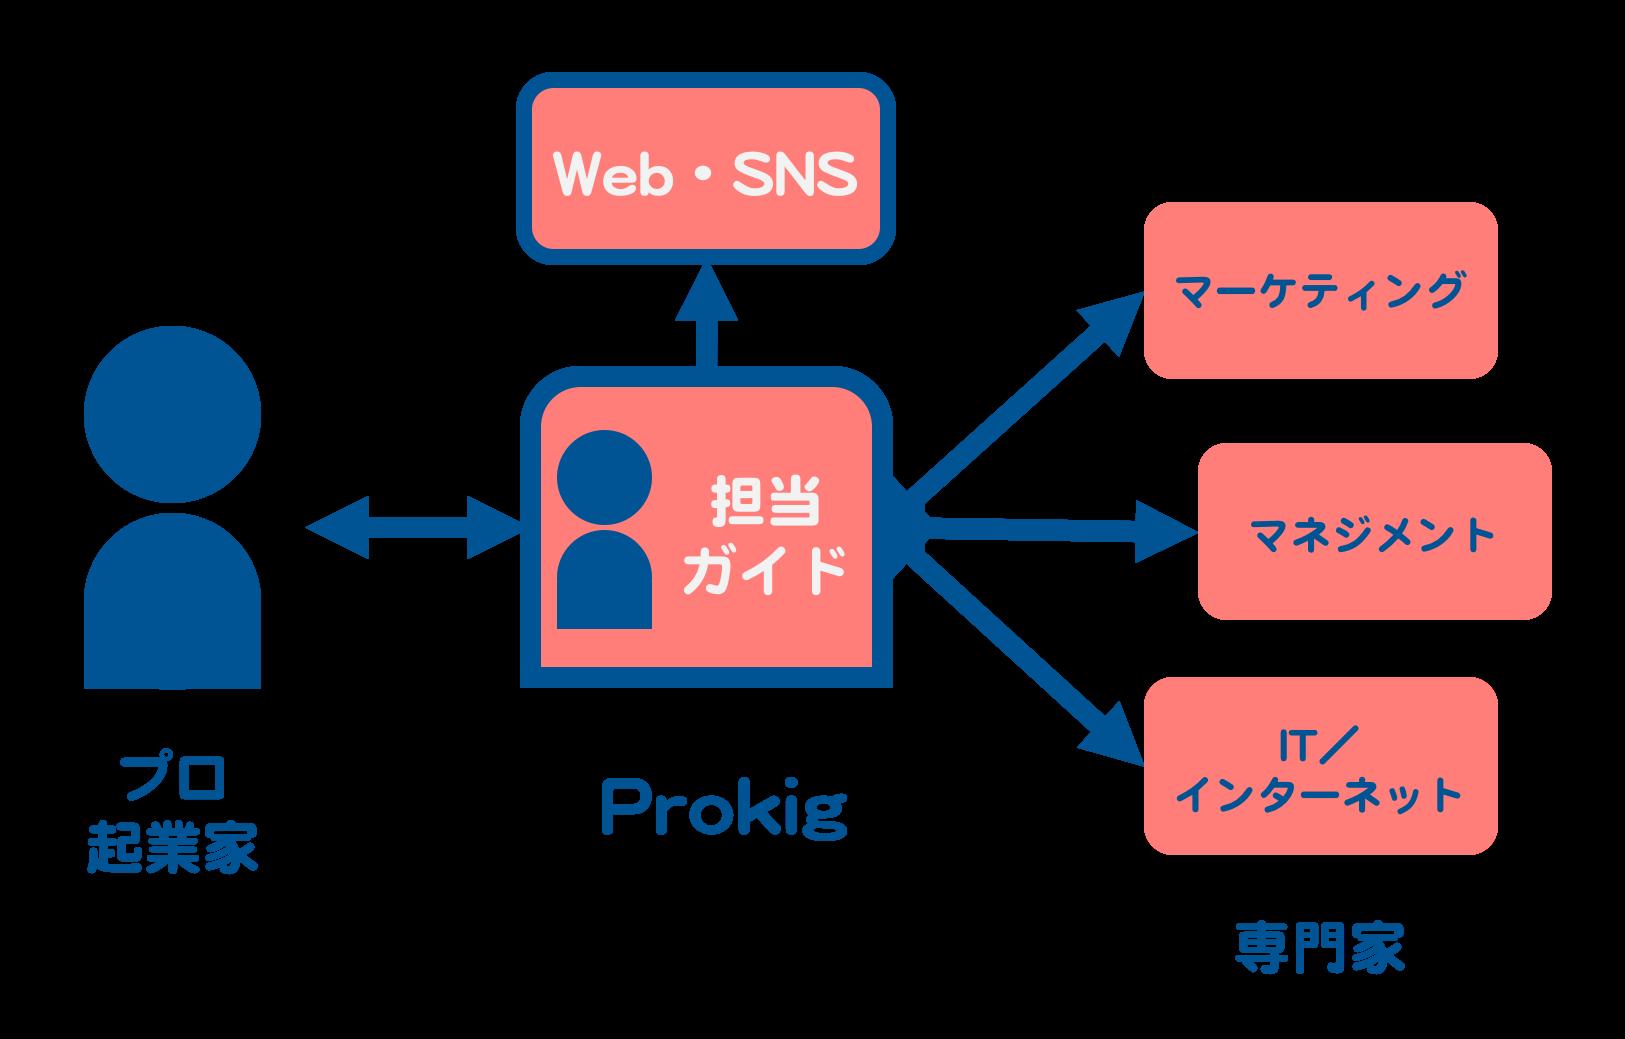 prokig_structure2